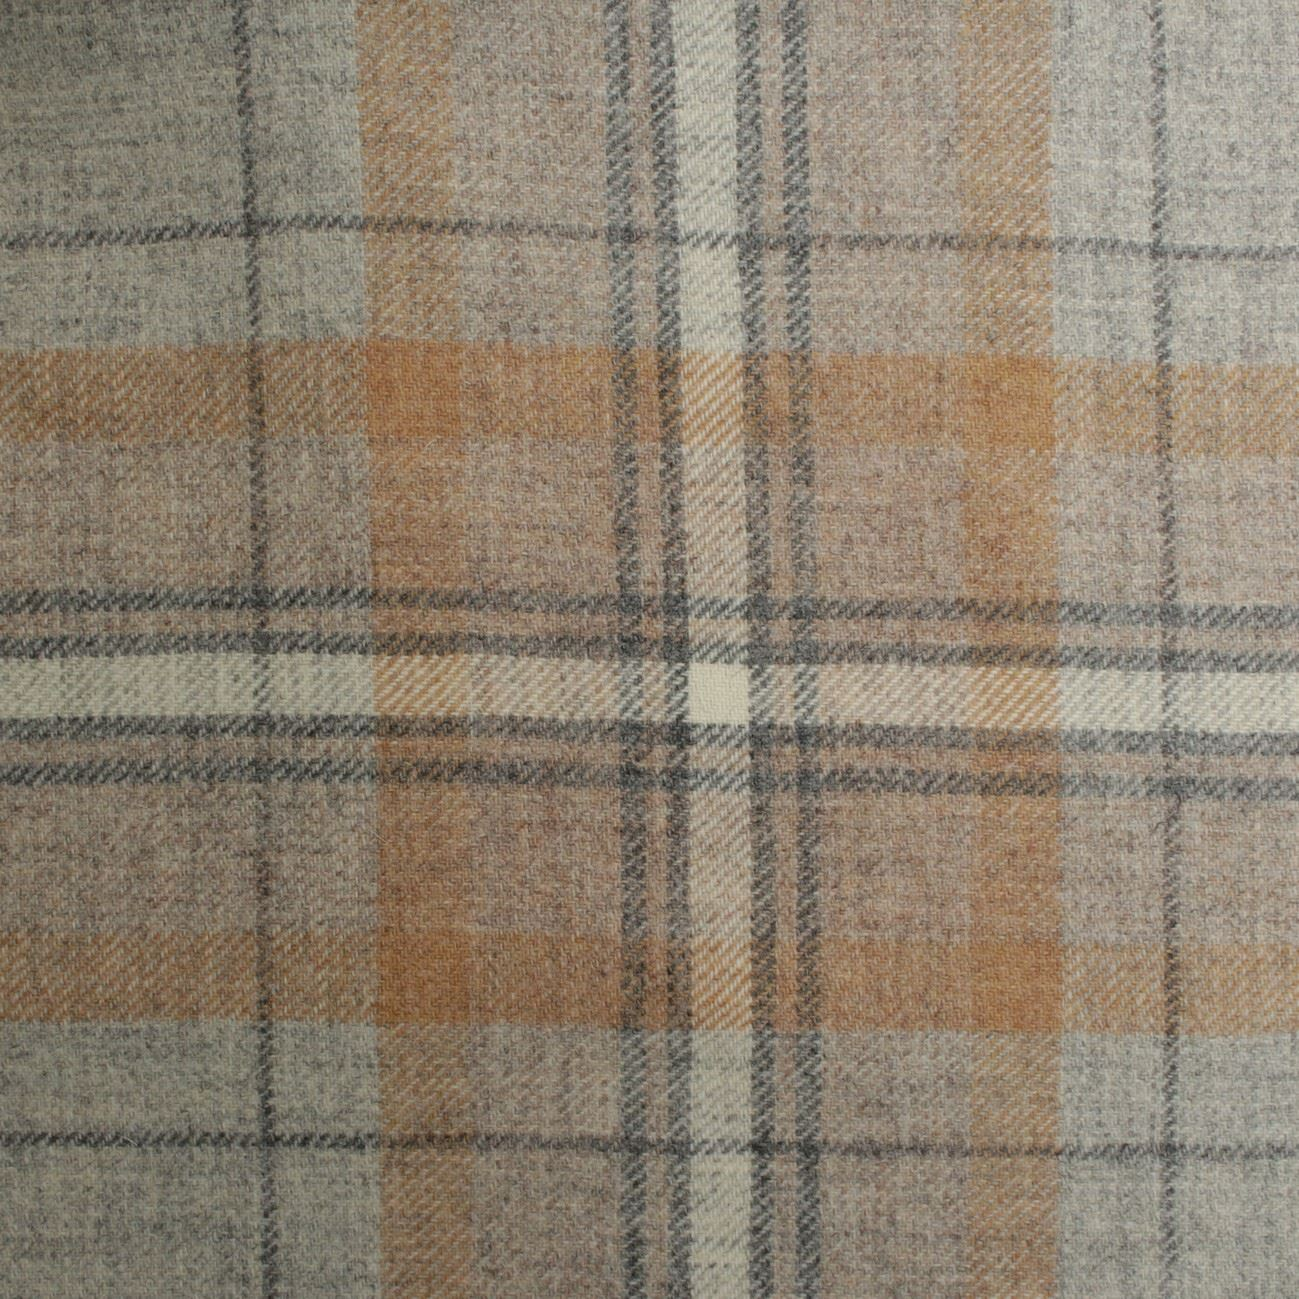 ... Scotish-Upholstery-Wool-Woven-Tartan-Check-Plaid-Curtain-Tweed-Fabric